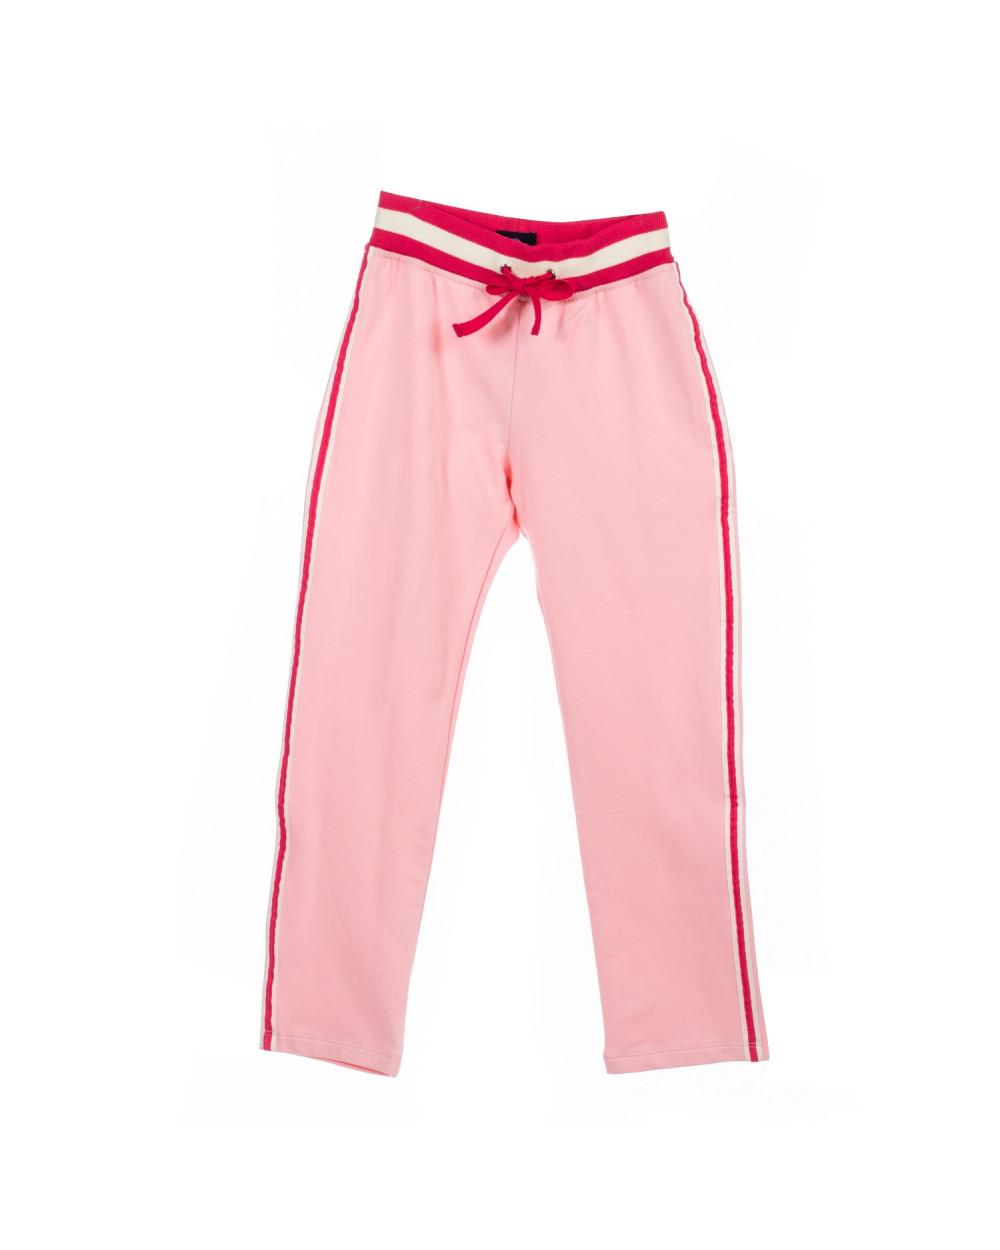 F. Twist Pantalón Buzo Niña Tejid. Diana